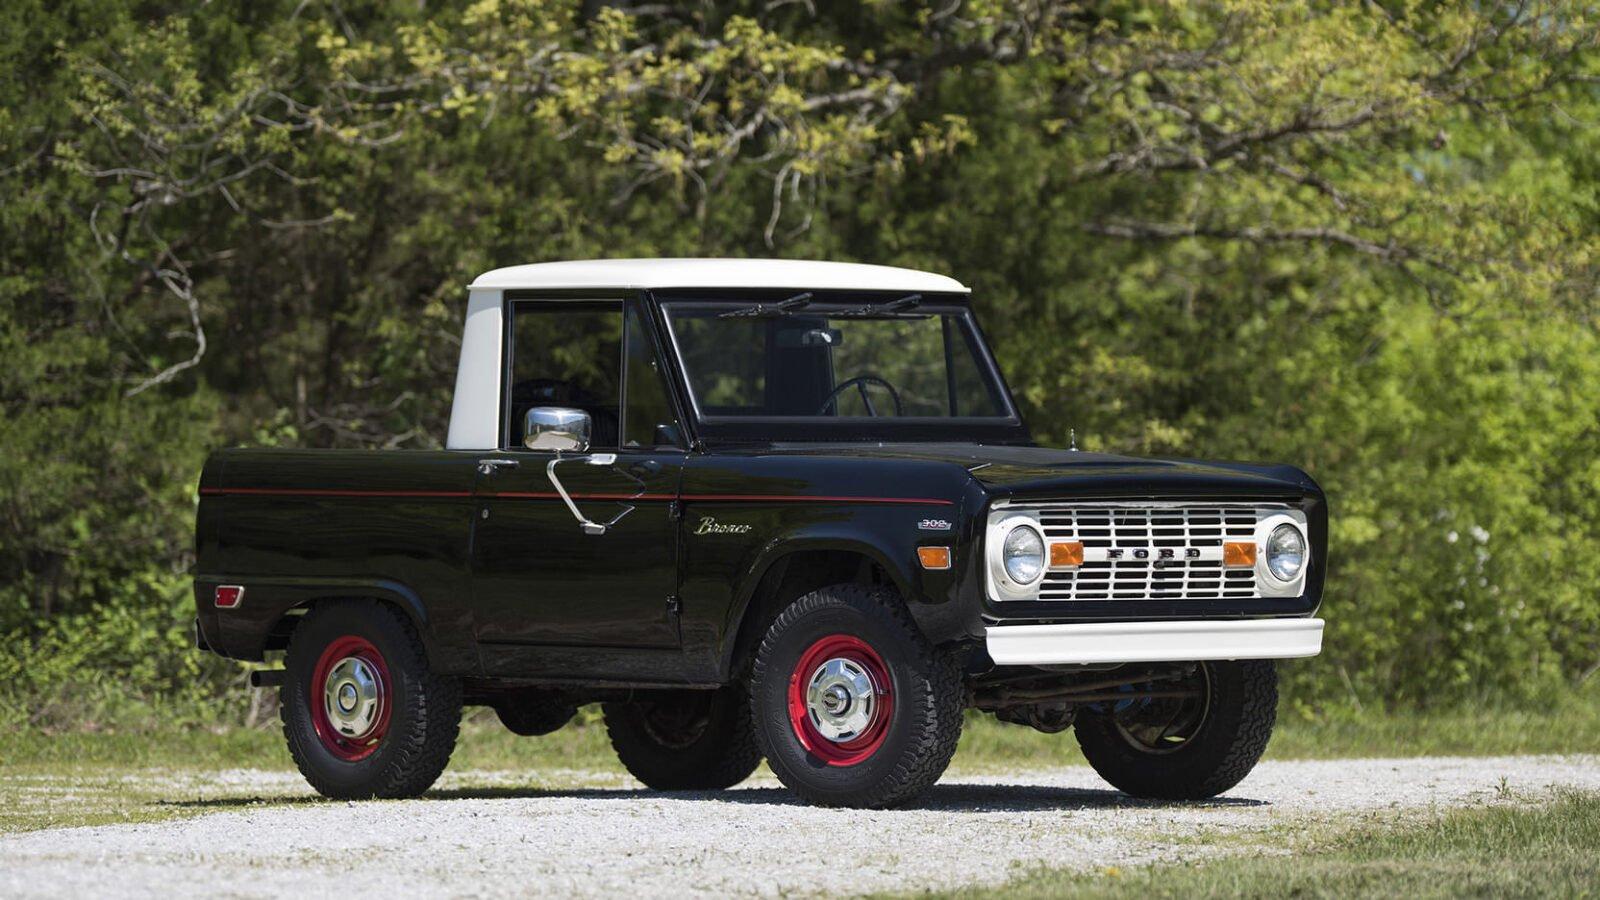 Ford Bronco Half Cab 11 1600x900